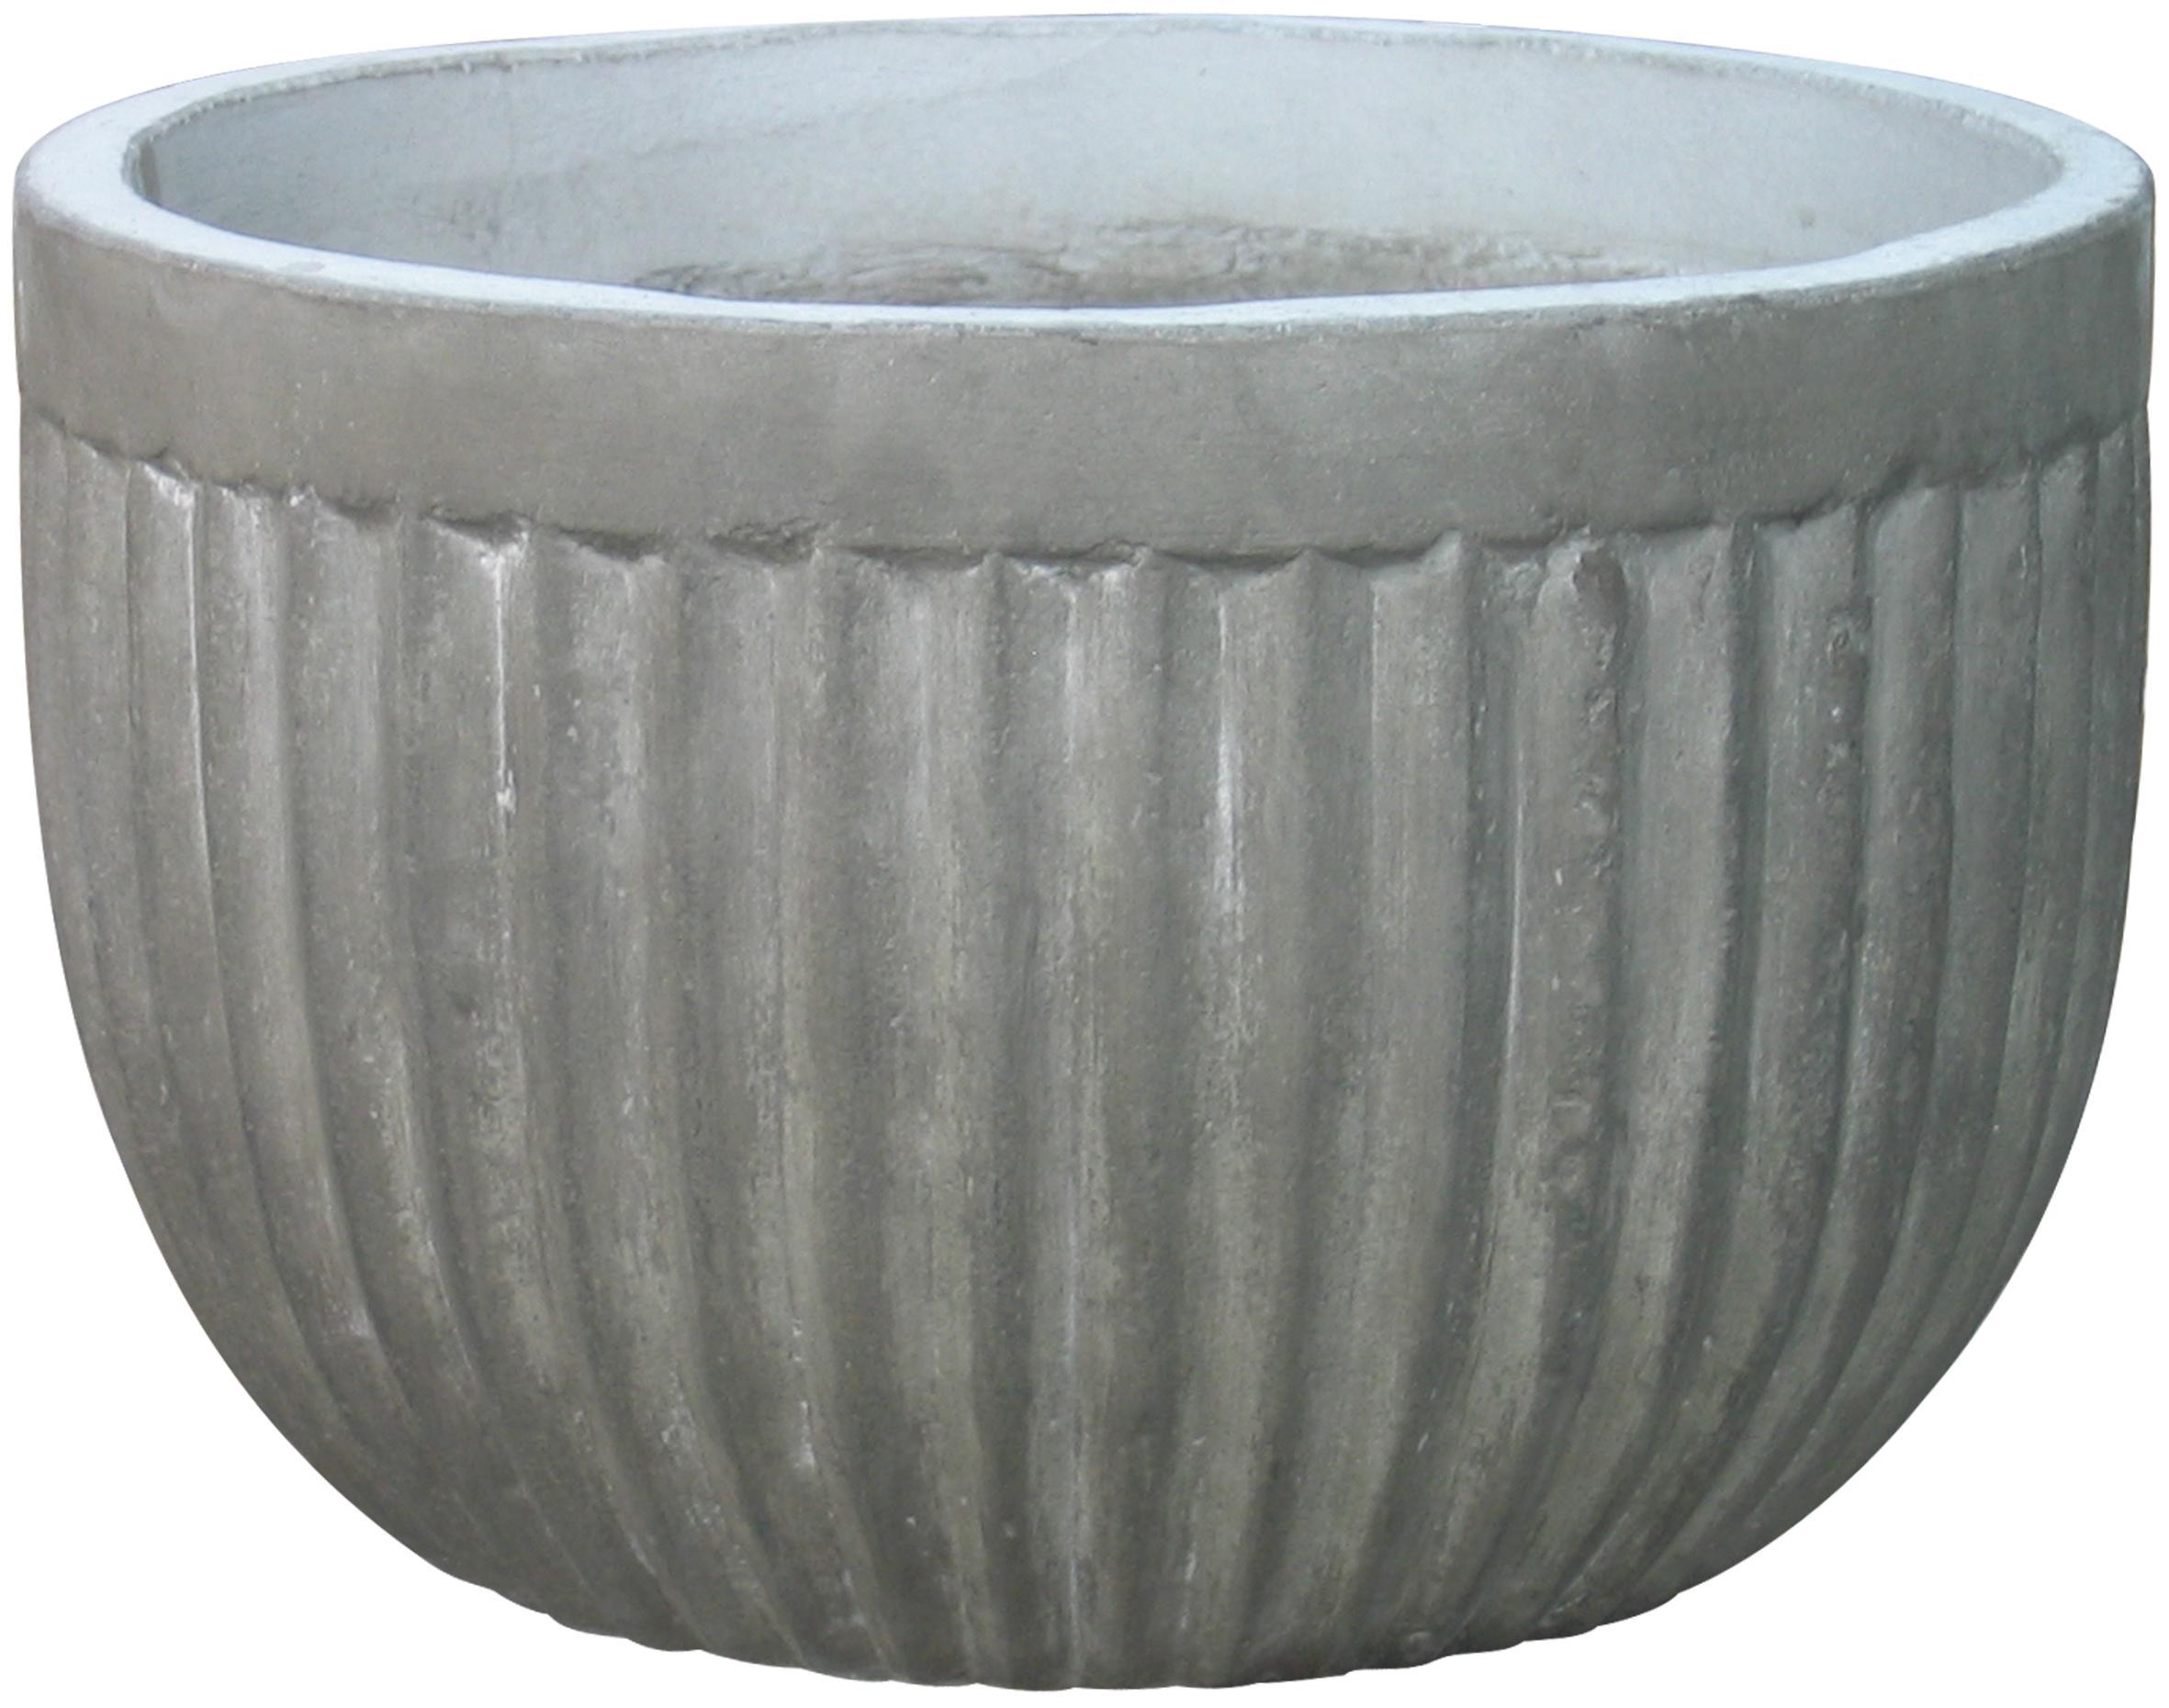 Athen Pot set of 2